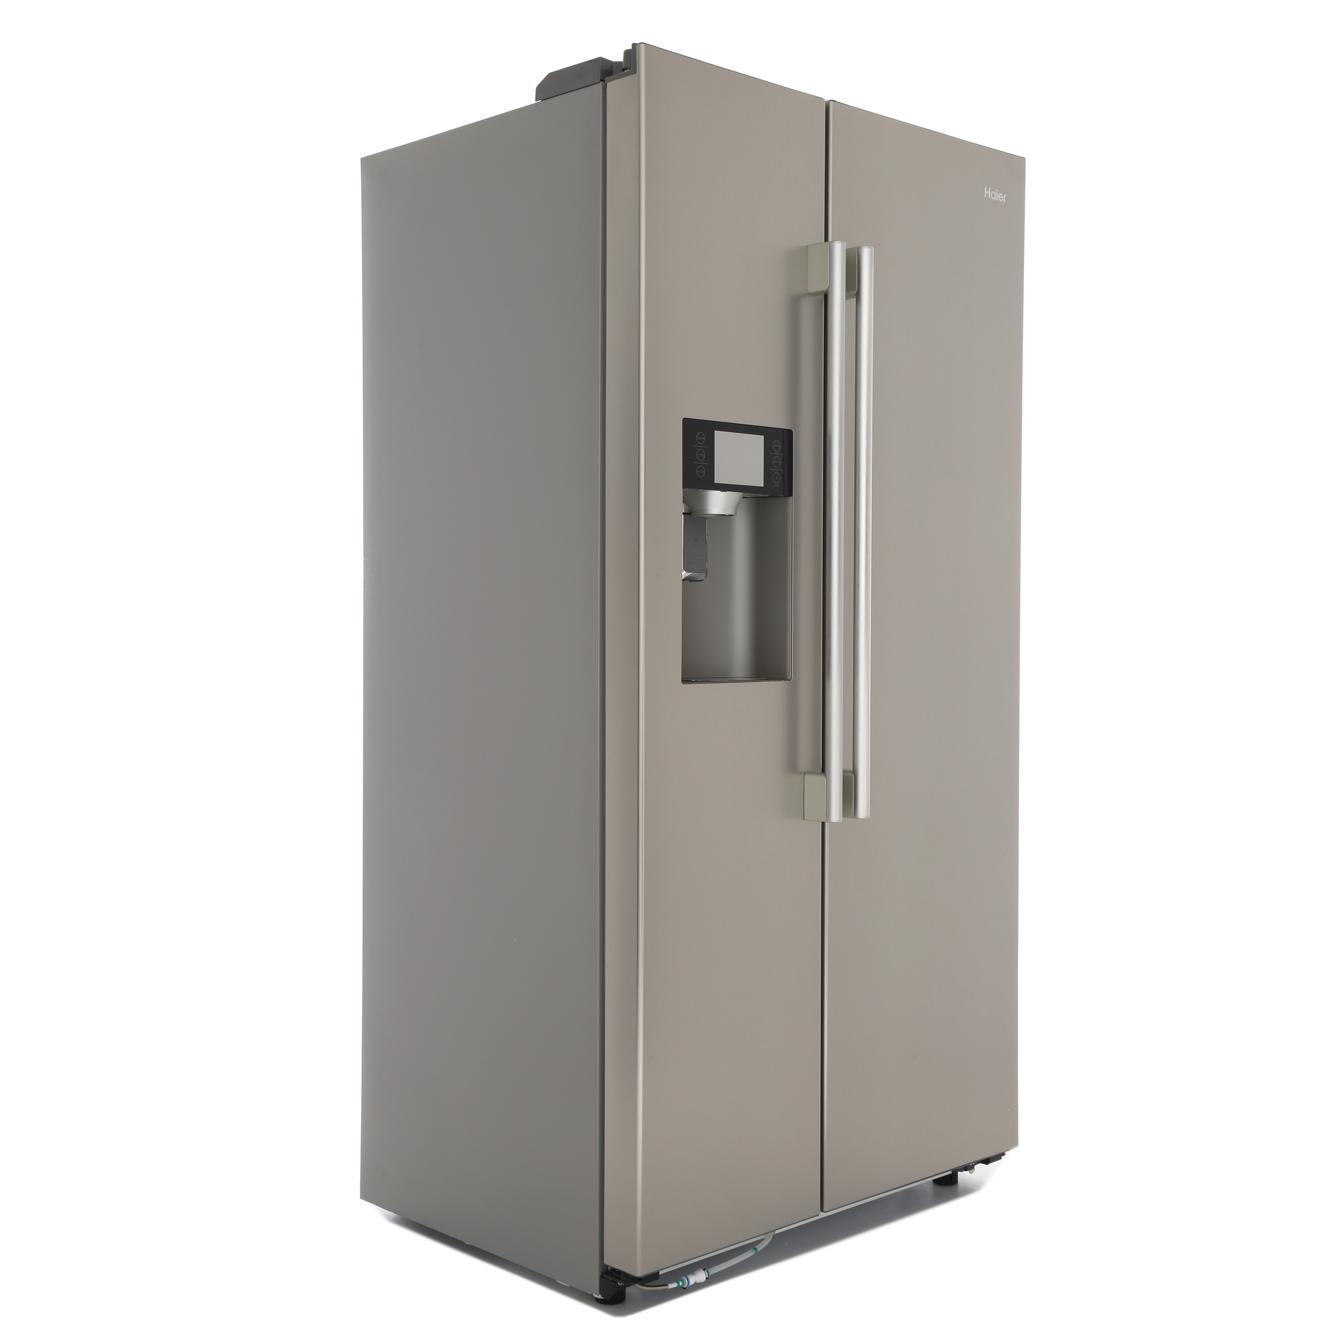 buy haier hrf 628if6 american fridge freezer stainless steel effect marks electrical. Black Bedroom Furniture Sets. Home Design Ideas